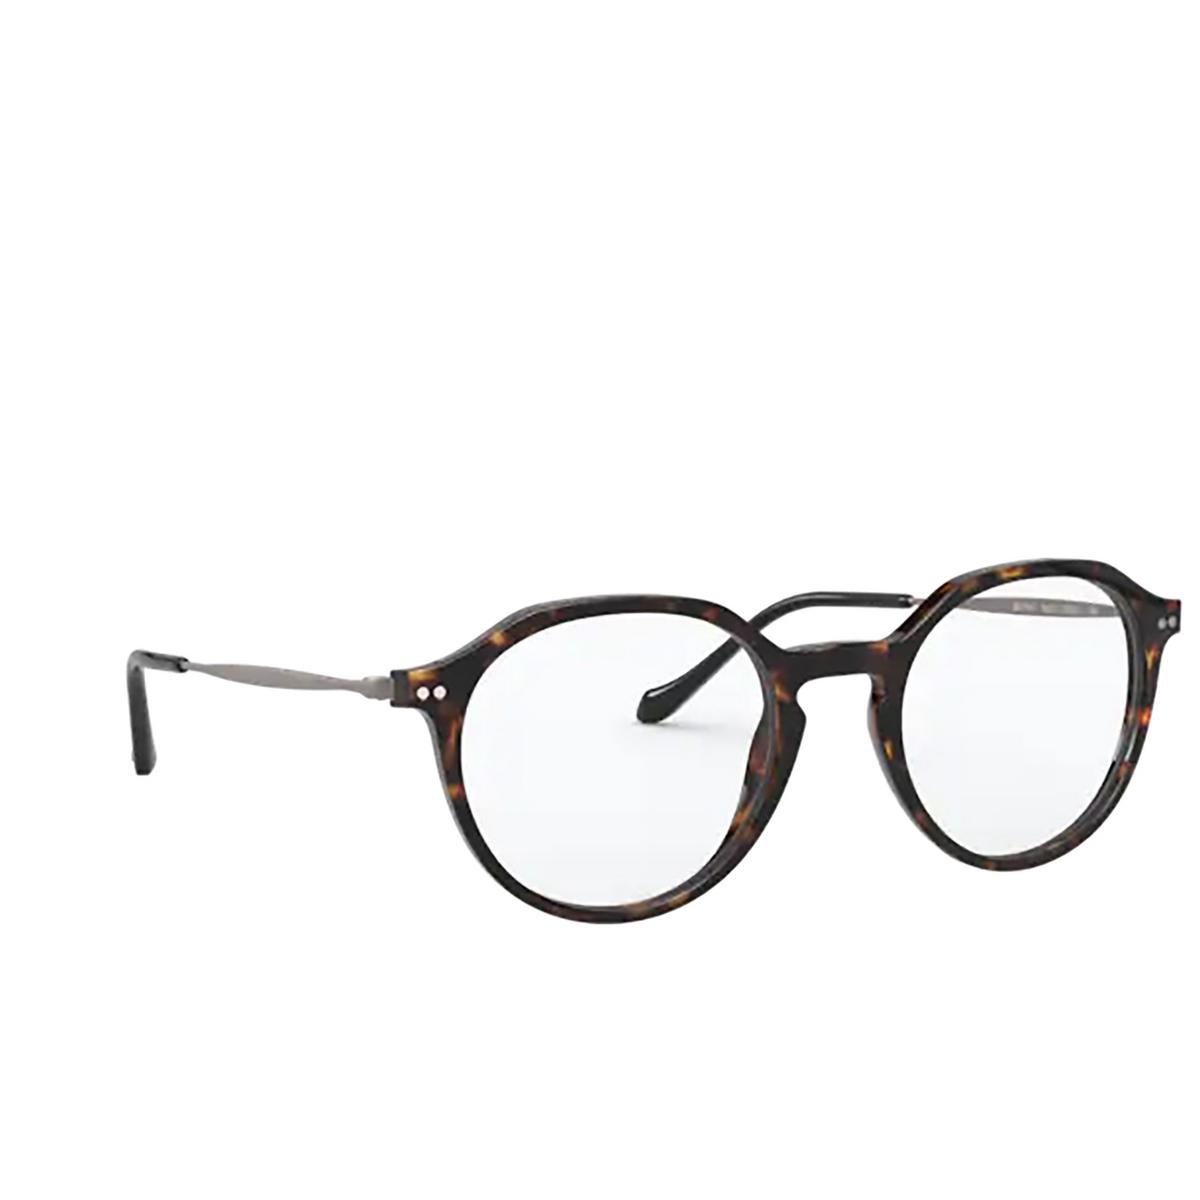 Giorgio Armani® Round Eyeglasses: AR7191 color Havana 5026 - three-quarters view.